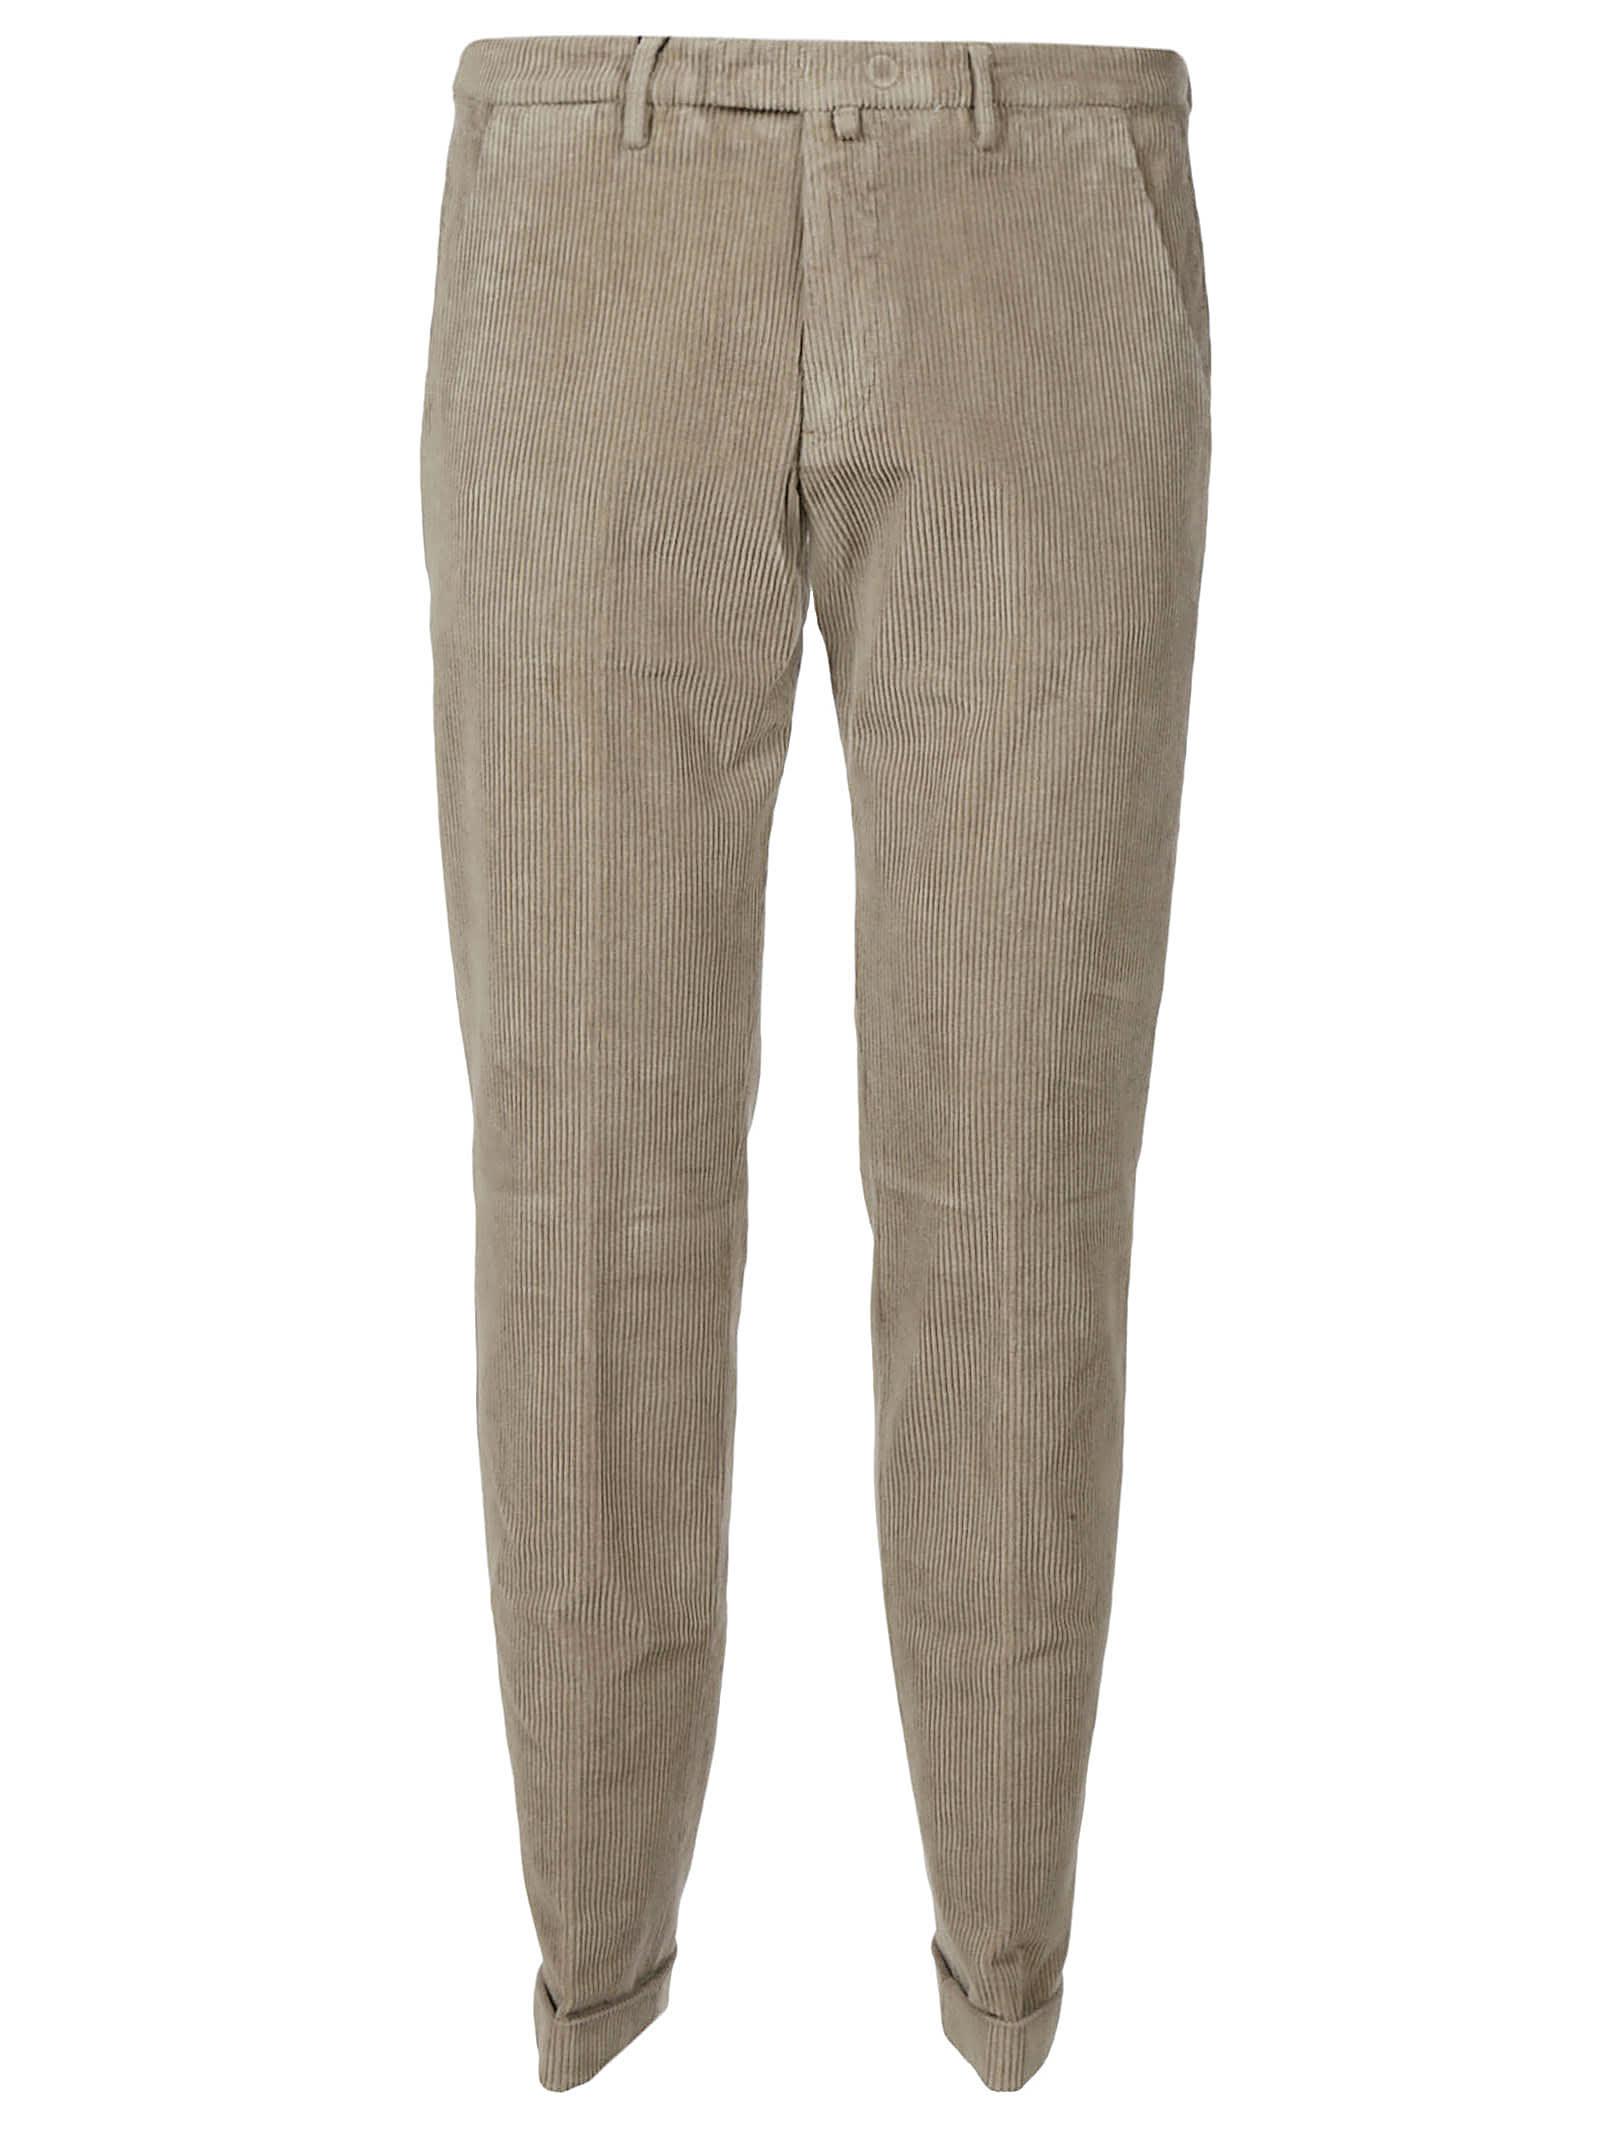 1949 Plain Cropped Corduroy Trousers